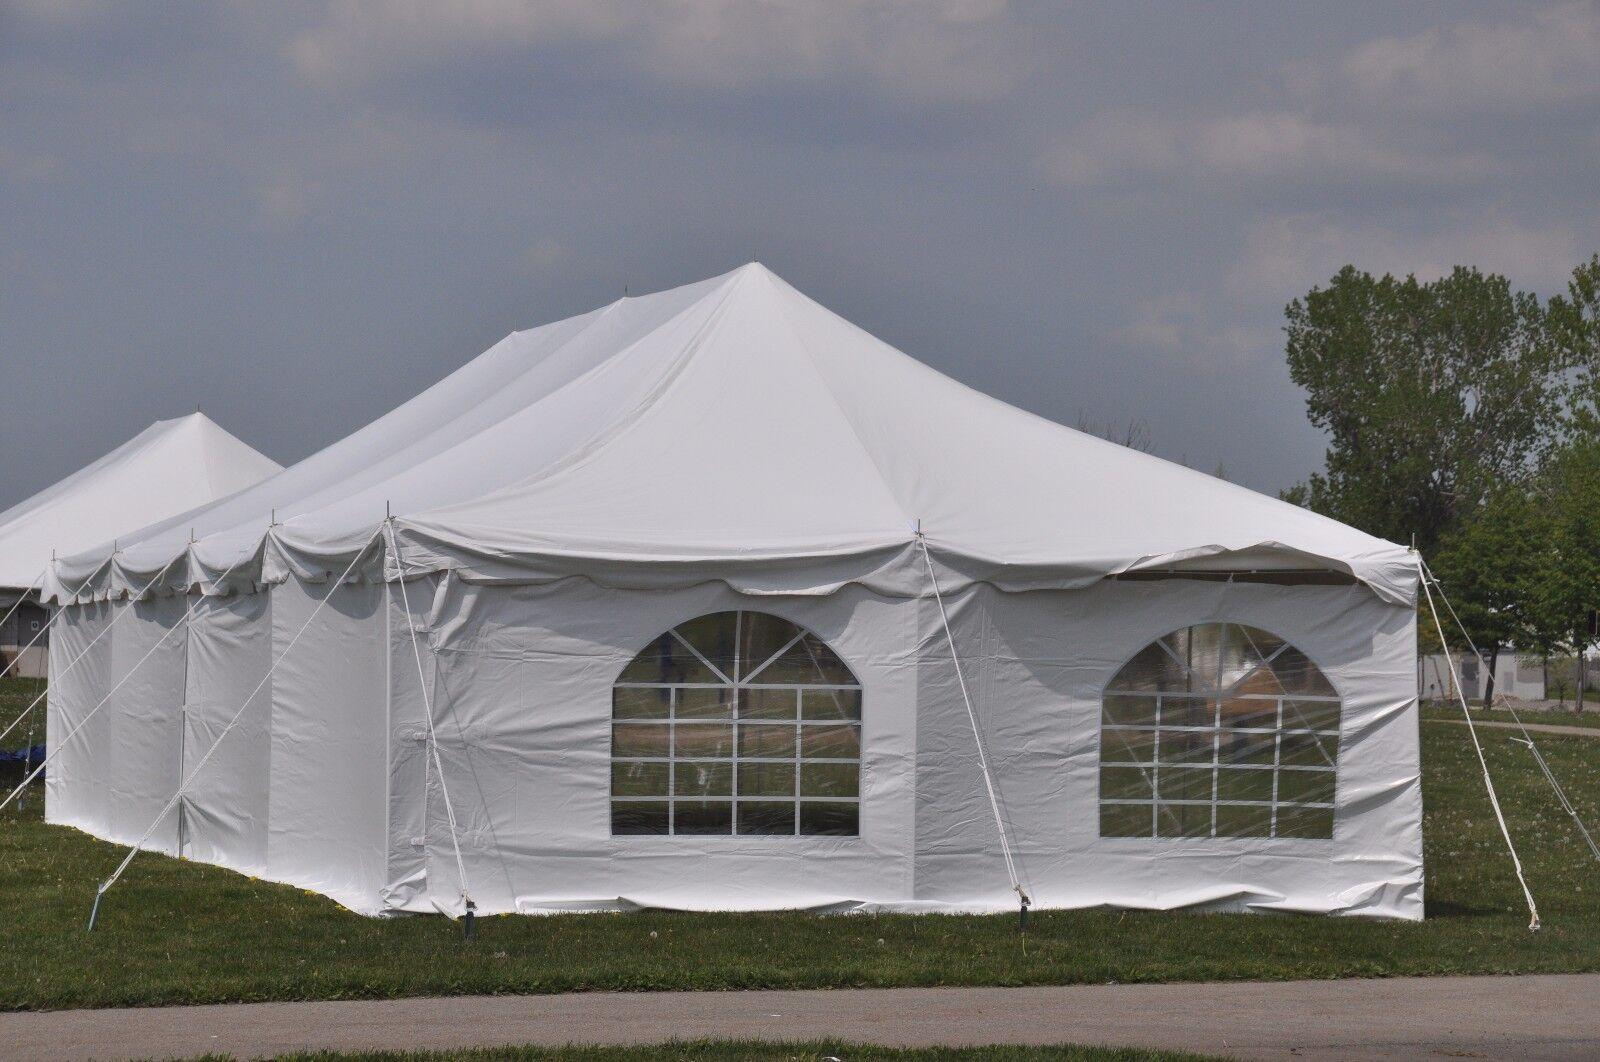 20x40 White Pole Tent Economy Party Tents Frame 4